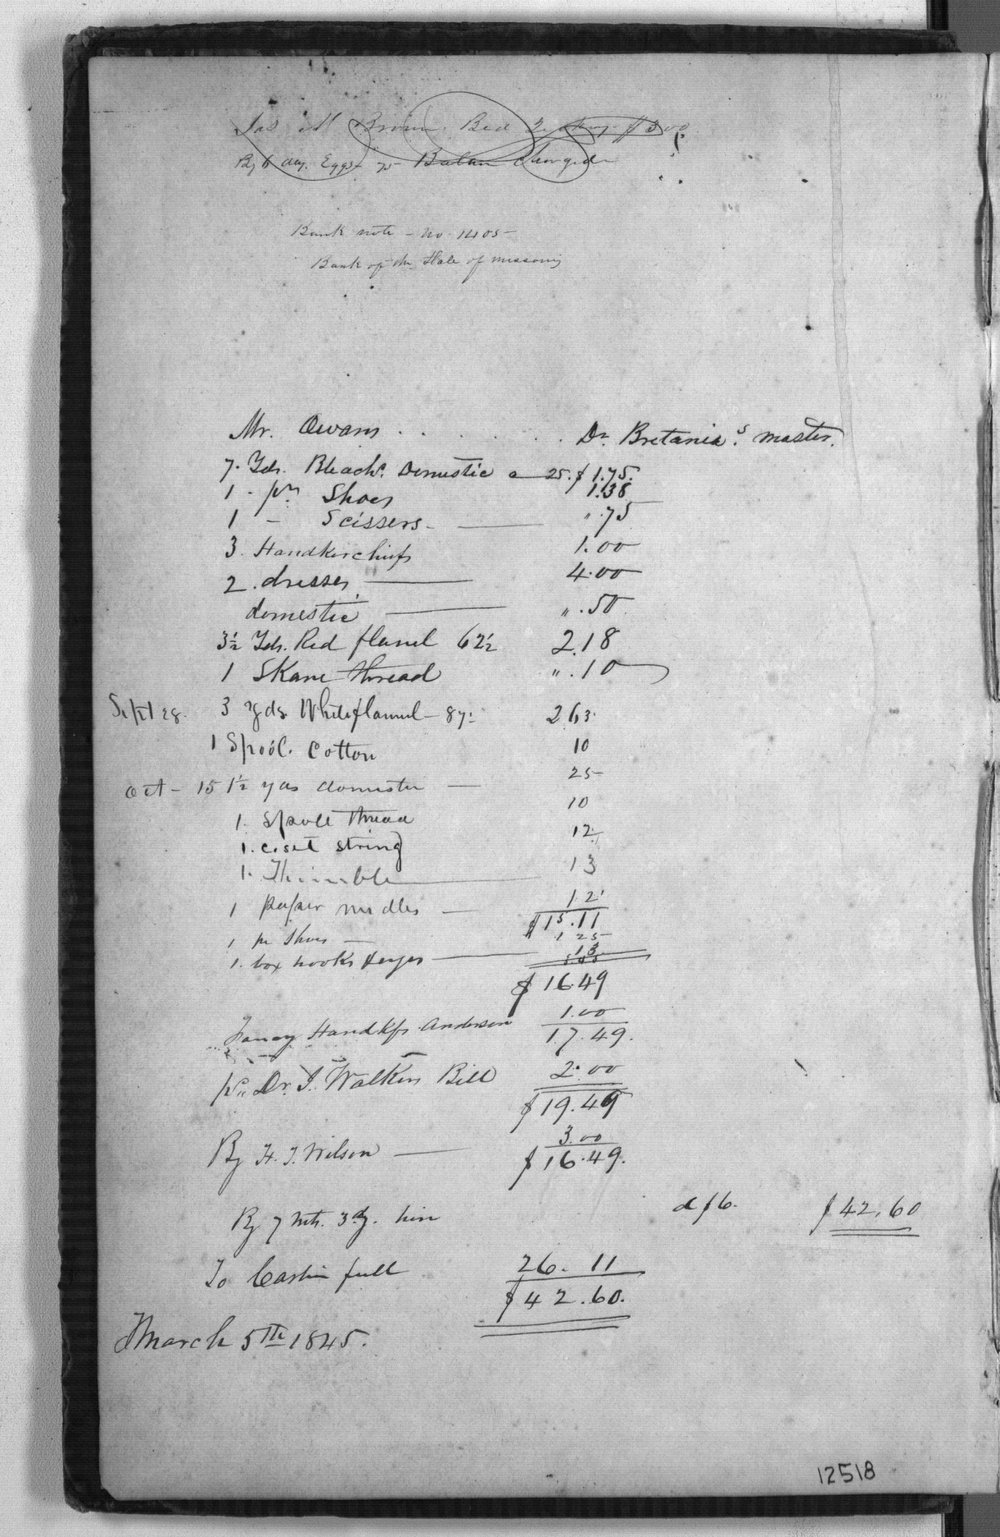 Post sutler's day book, Fort Scott - 1